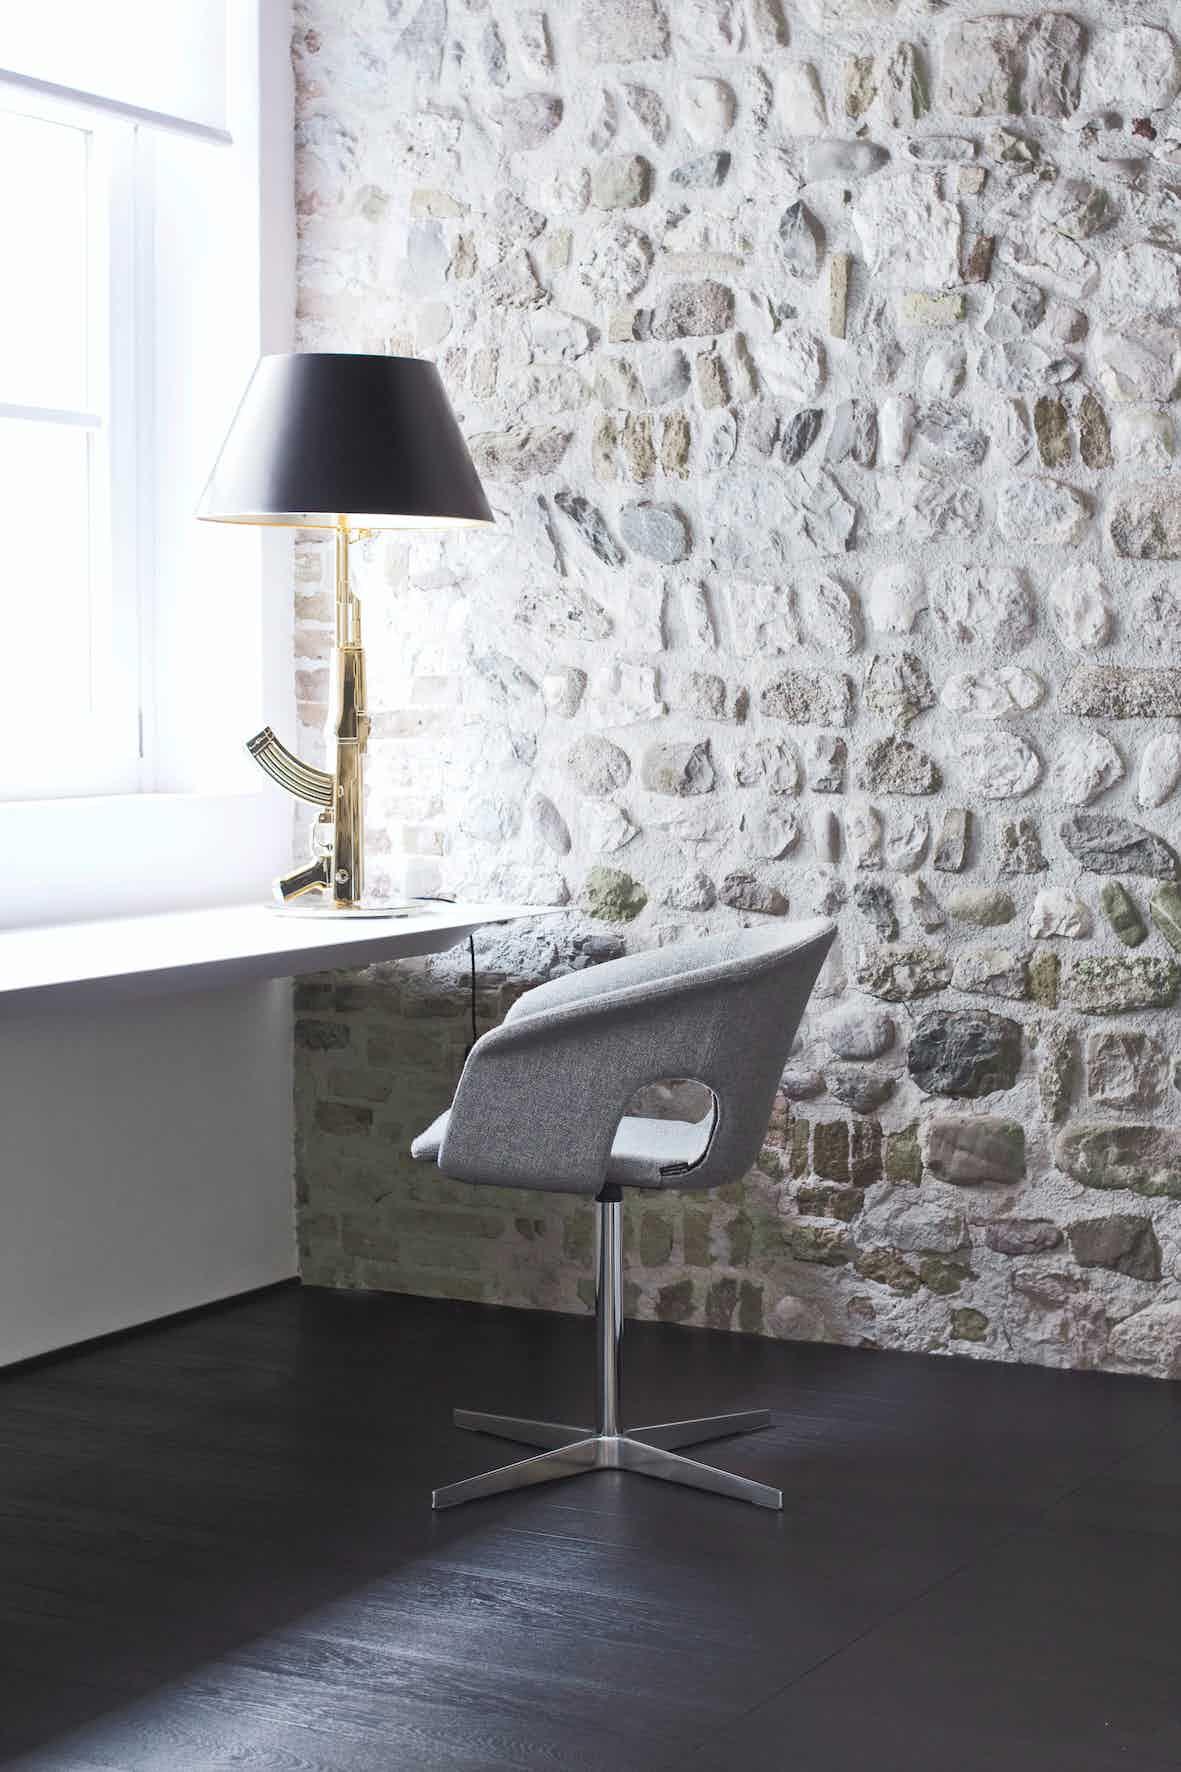 Lacividina-bennett-armchair-insitu-at-desk-haute-living